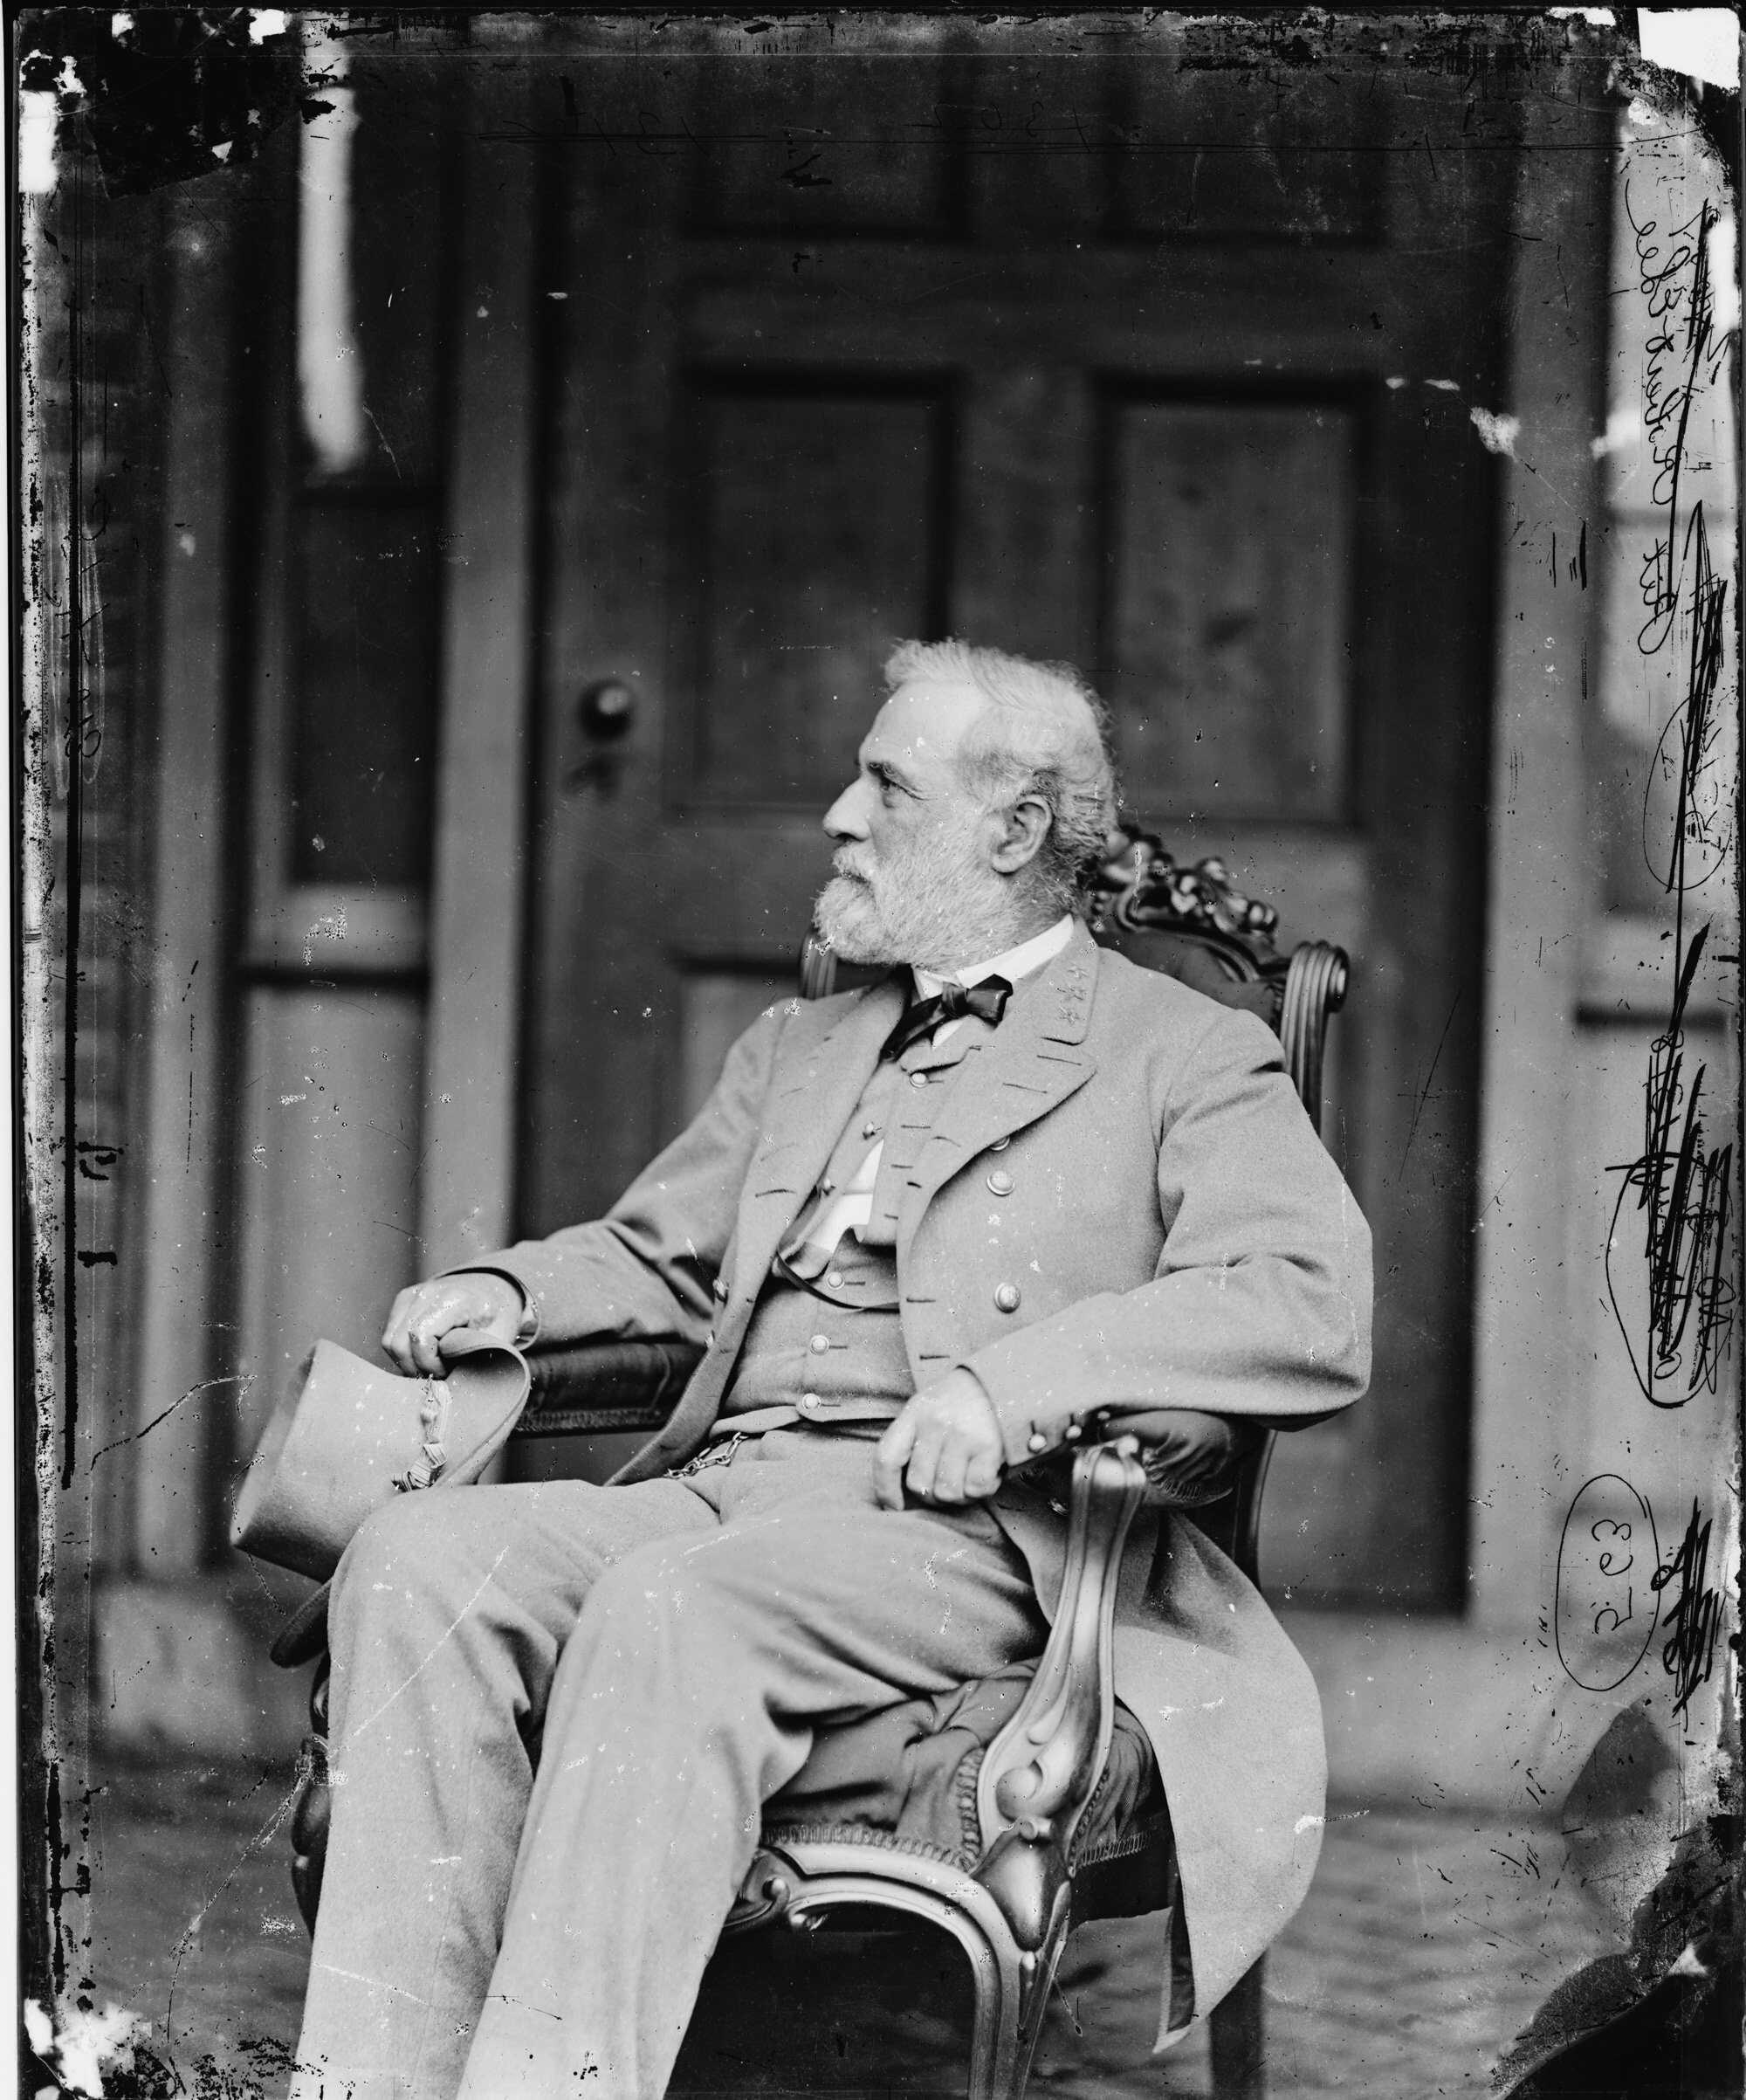 Lee-Timeline-Old-Chair-(5006)-03115a.jpg